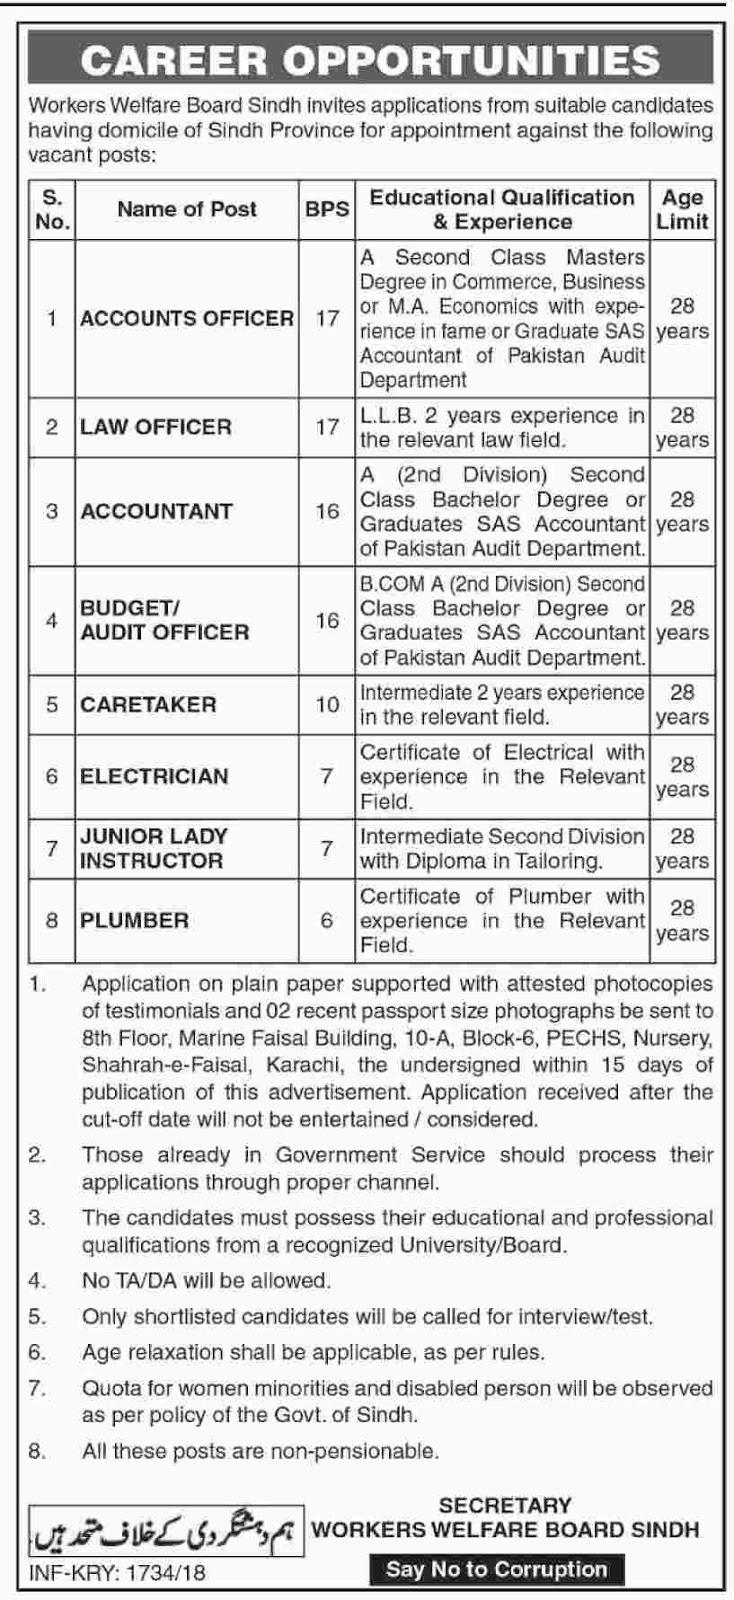 Workers-Welfare-Board-Sindh